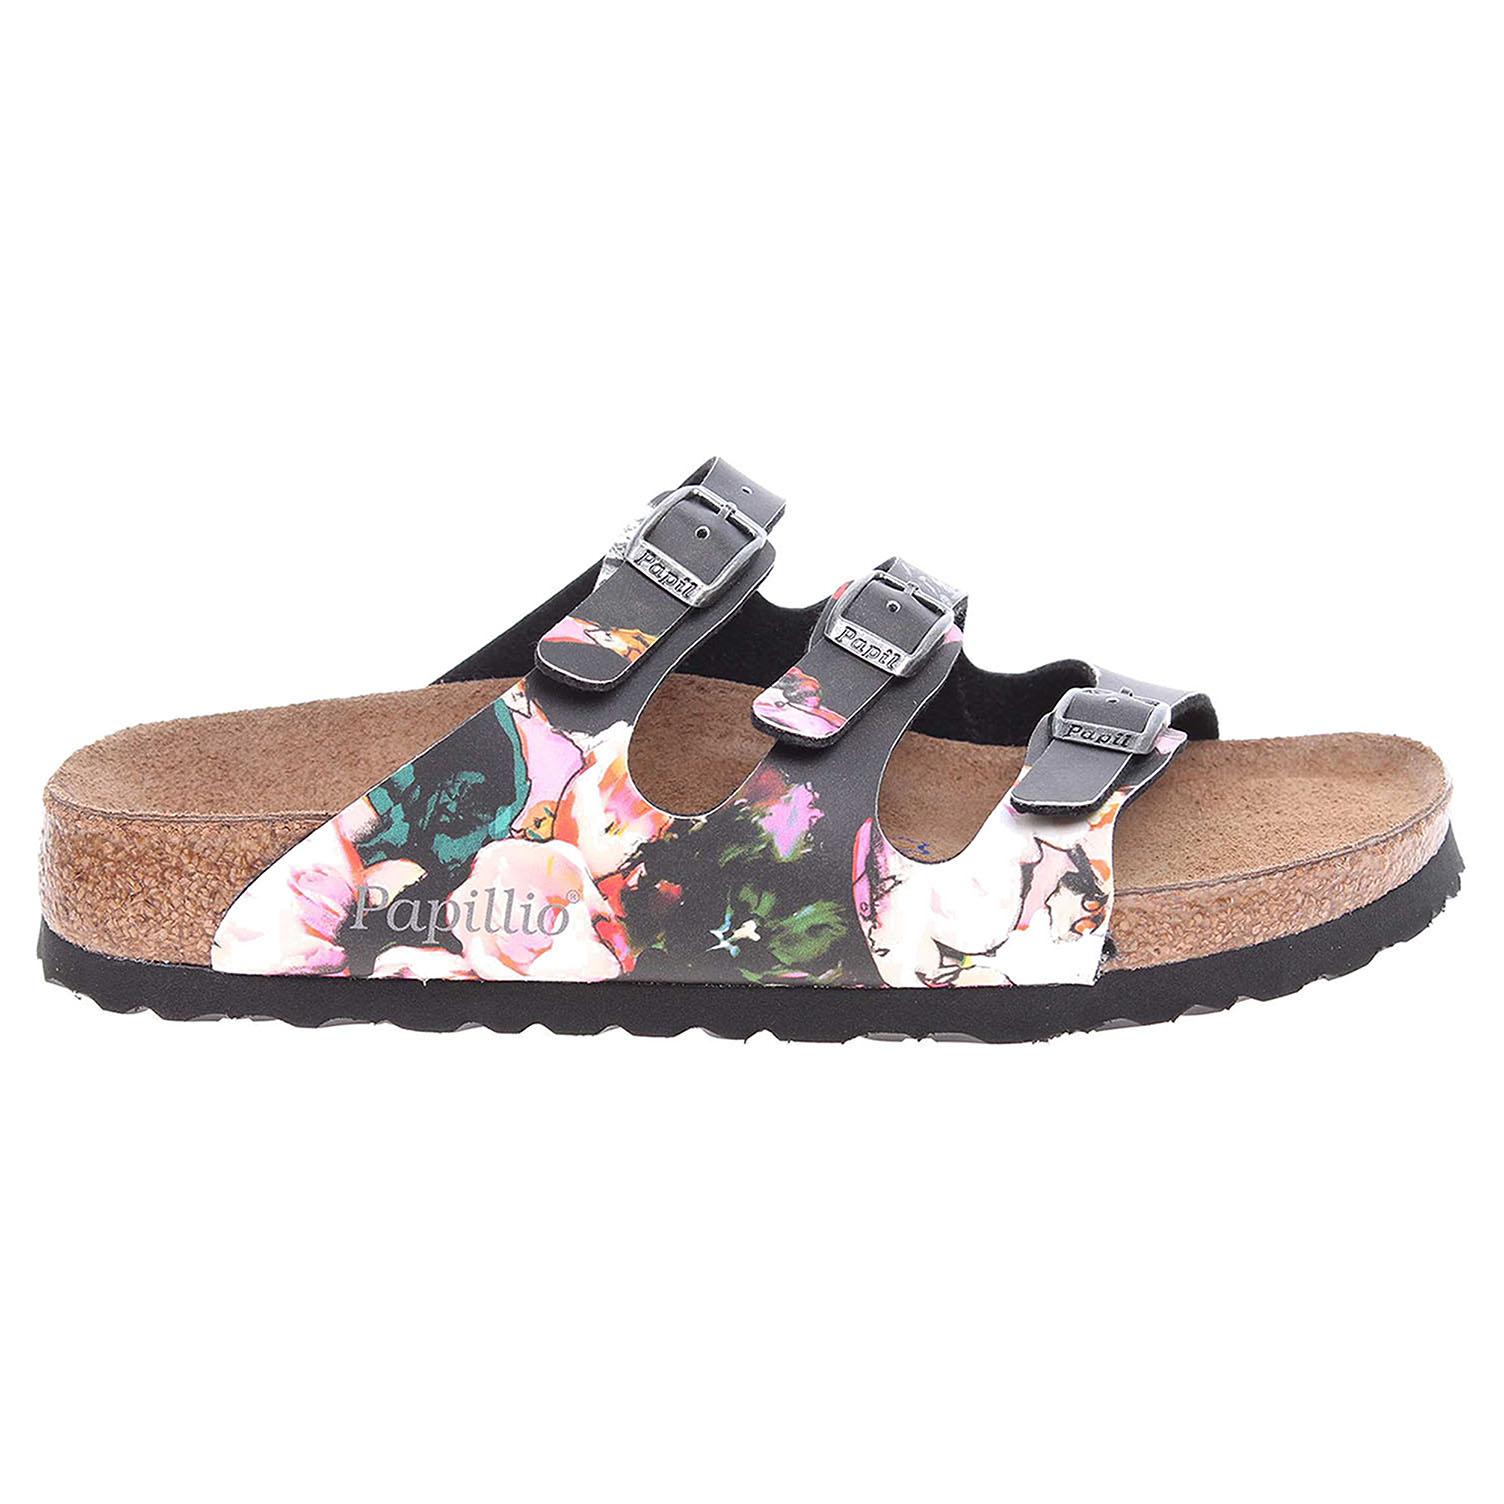 Papillio Florifa dámské pantofle 1000465 černé 41